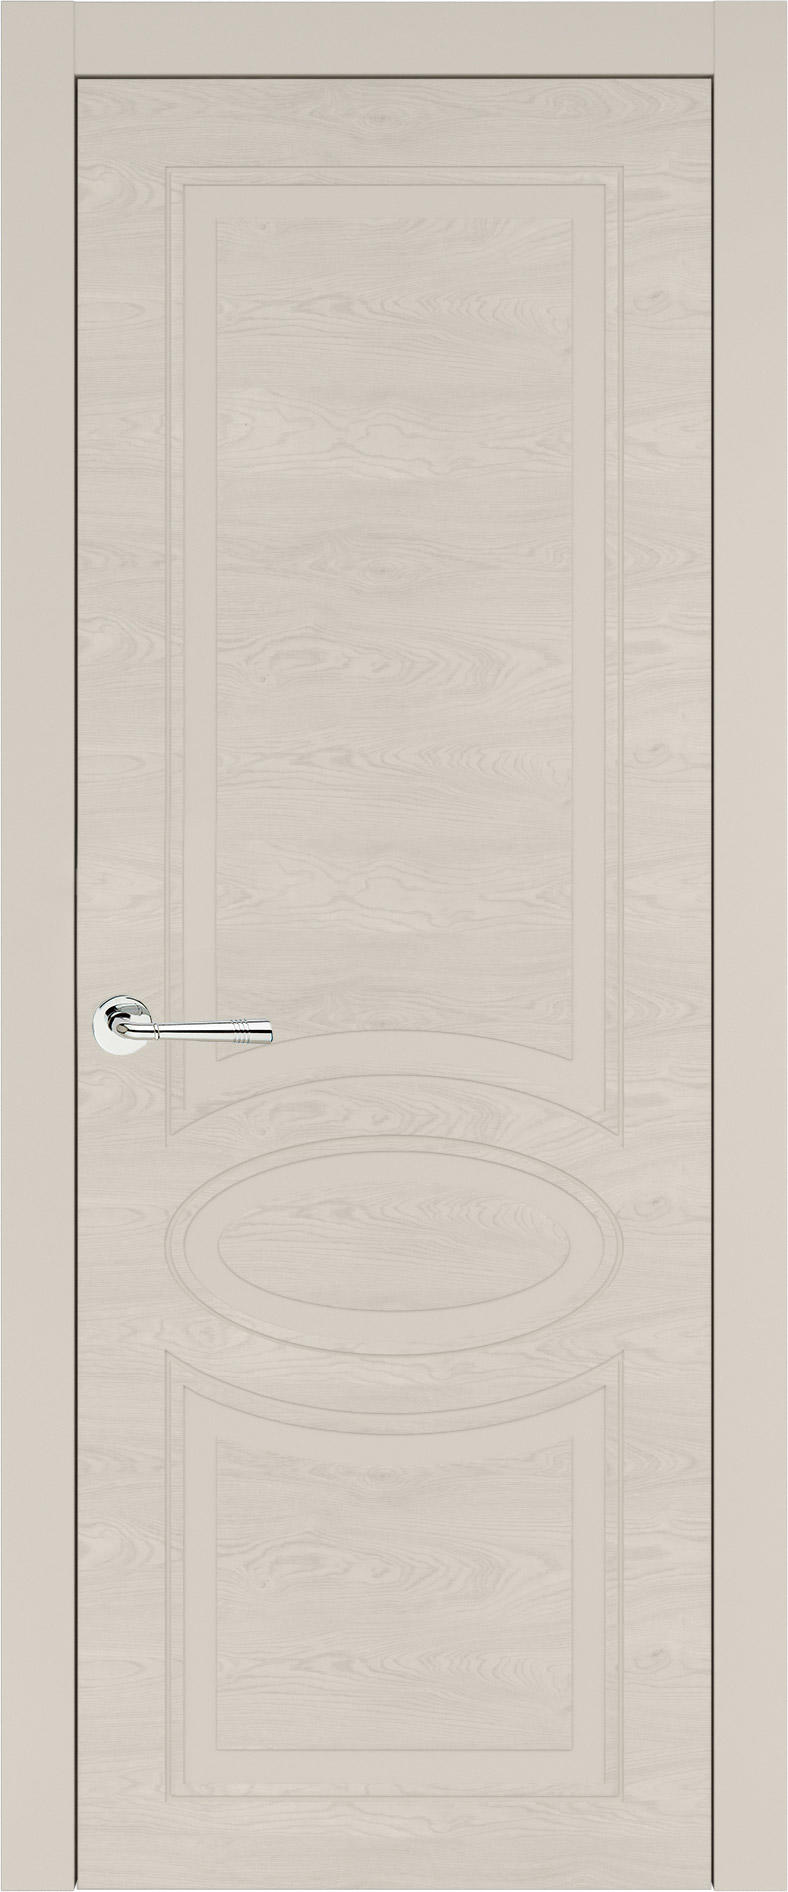 Florencia Neo Classic цвет - Жемчужная эмаль по шпону (RAL 1013) Без стекла (ДГ)